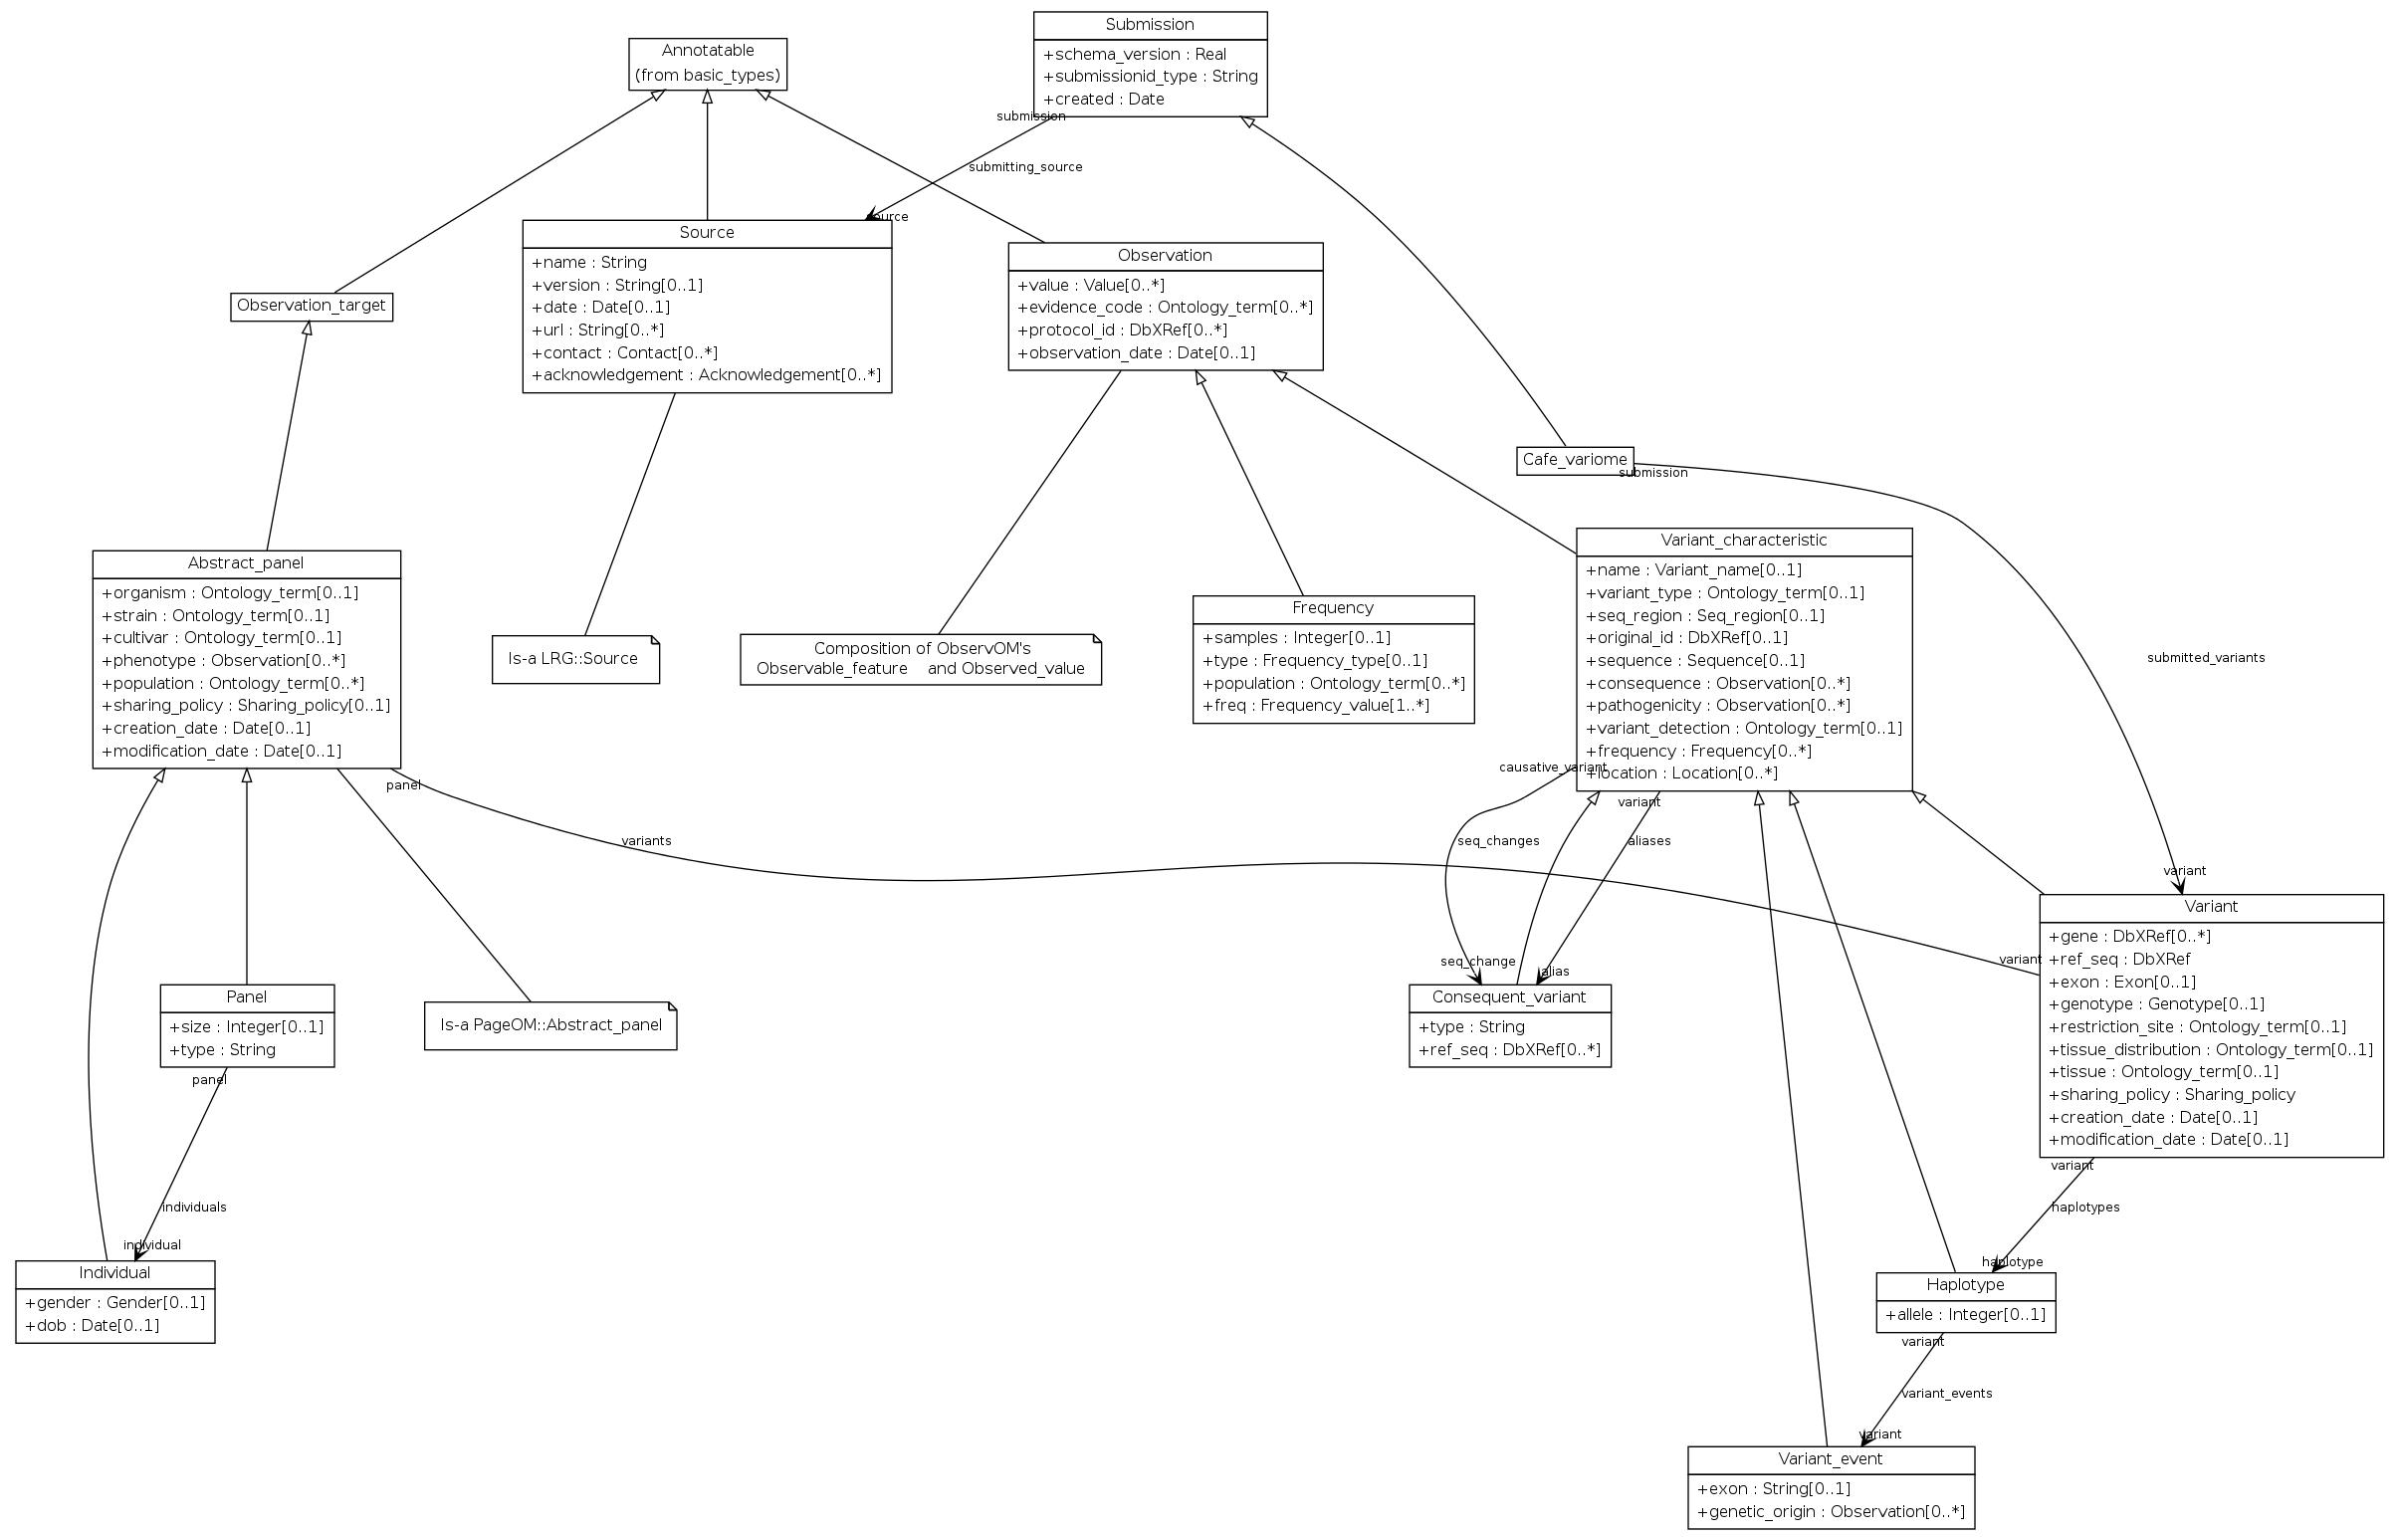 VarioML framework for comprehensive variation data